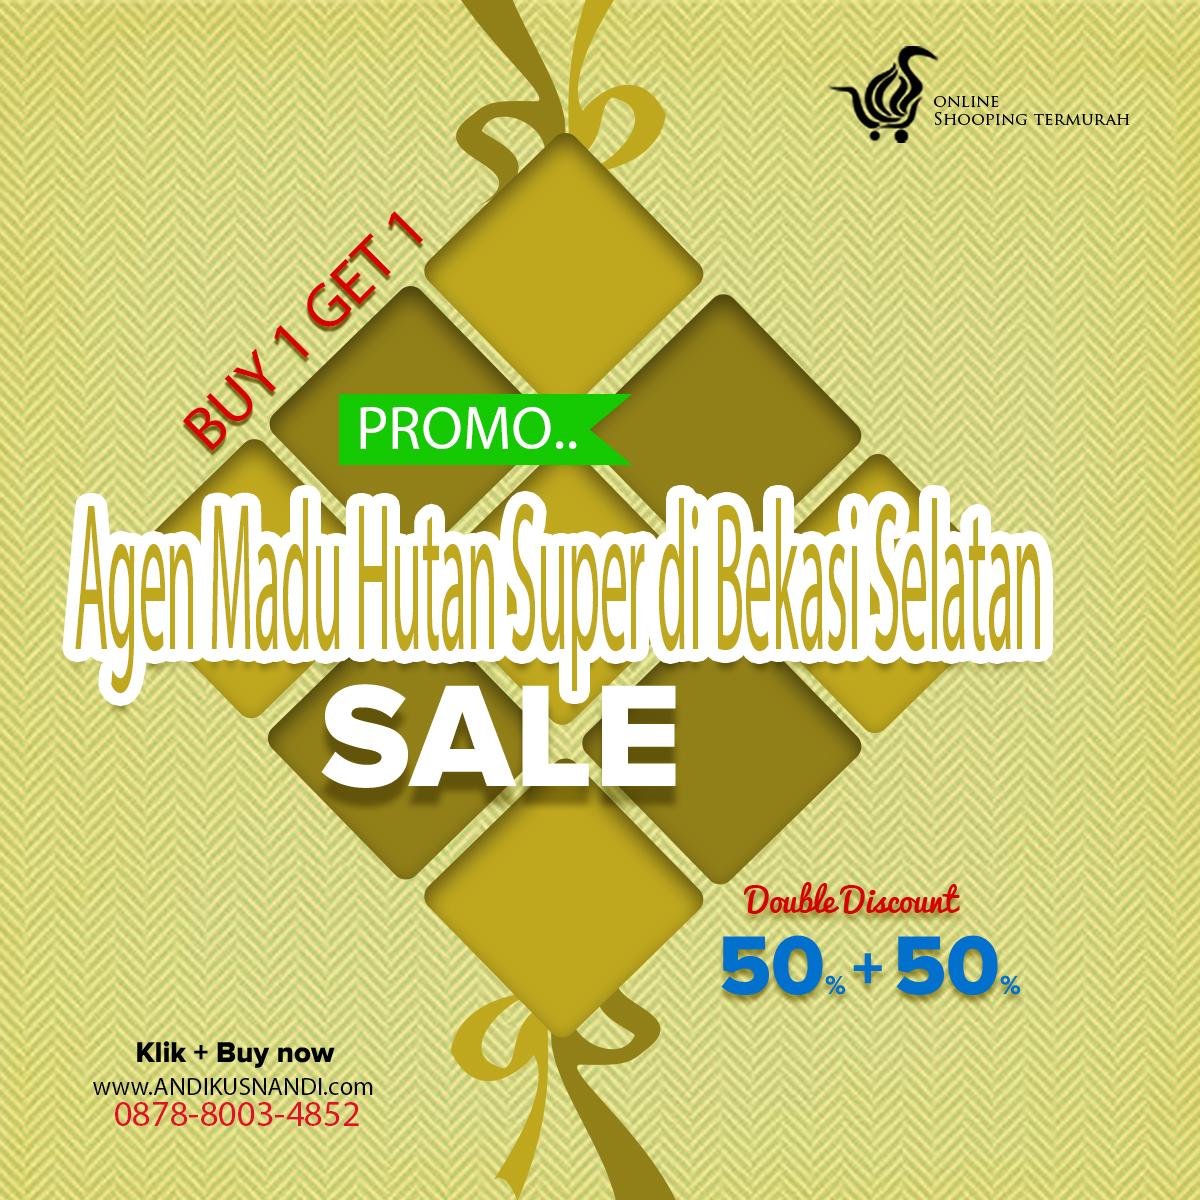 WA 0878-8003-4852 Agen Madu Hutan Super di Bekasi Selatan